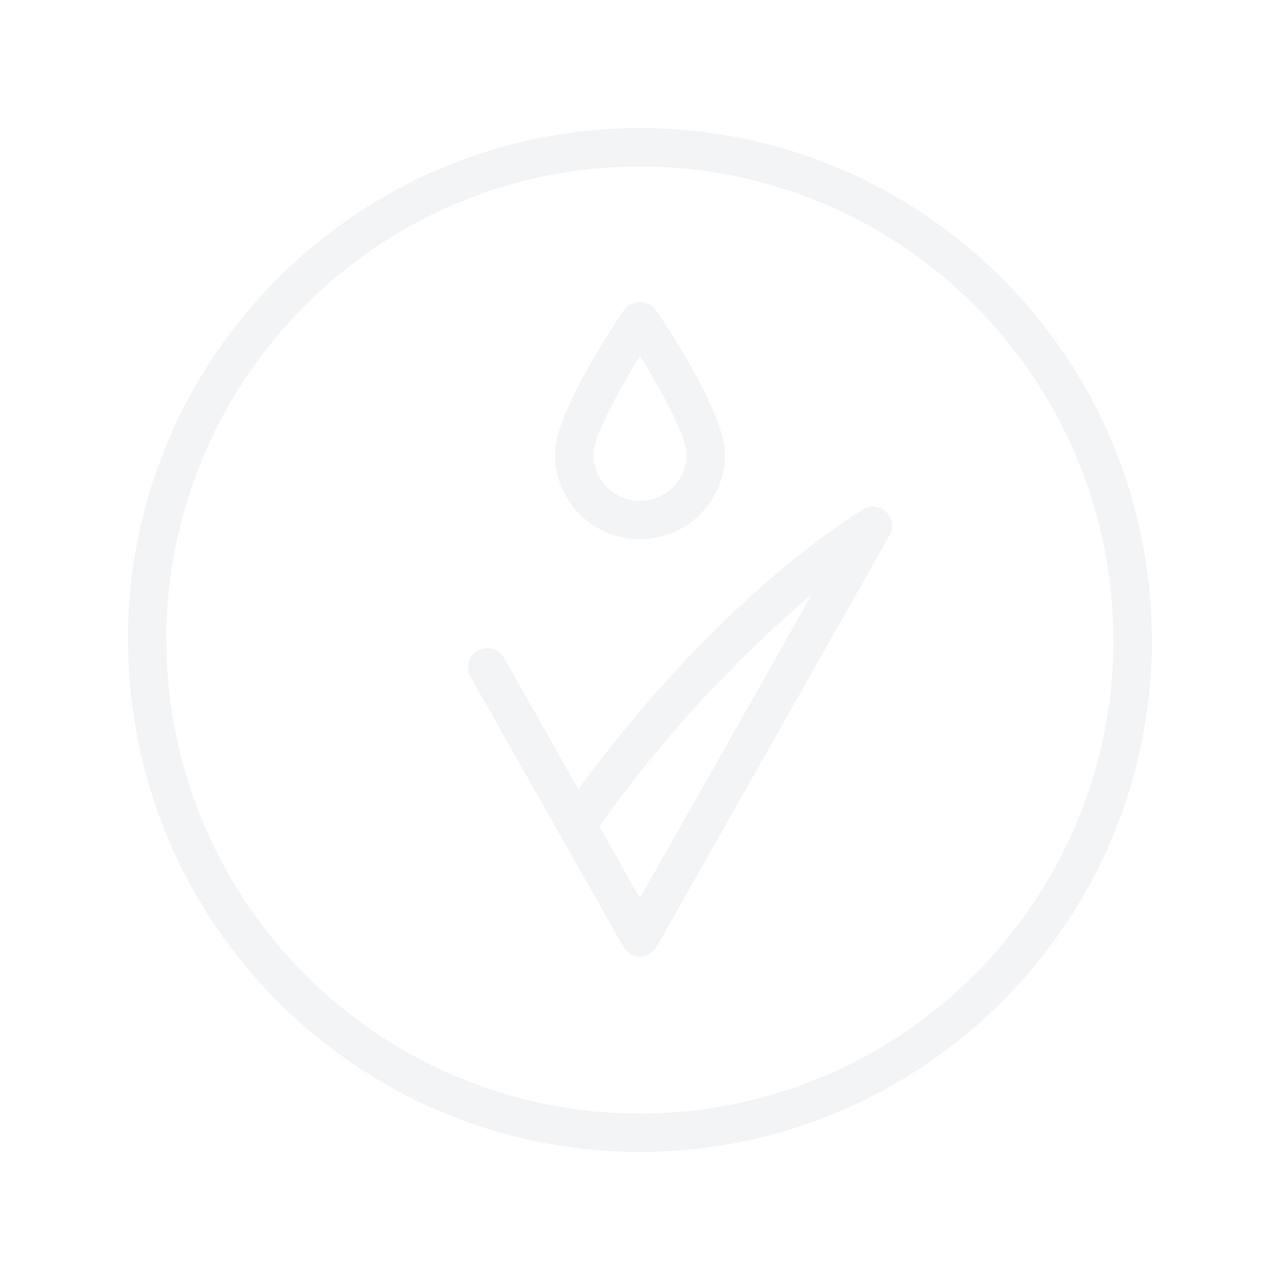 GIORGIO ARMANI Acqua Di Gioia 100ml Eau De Parfum Gift Set